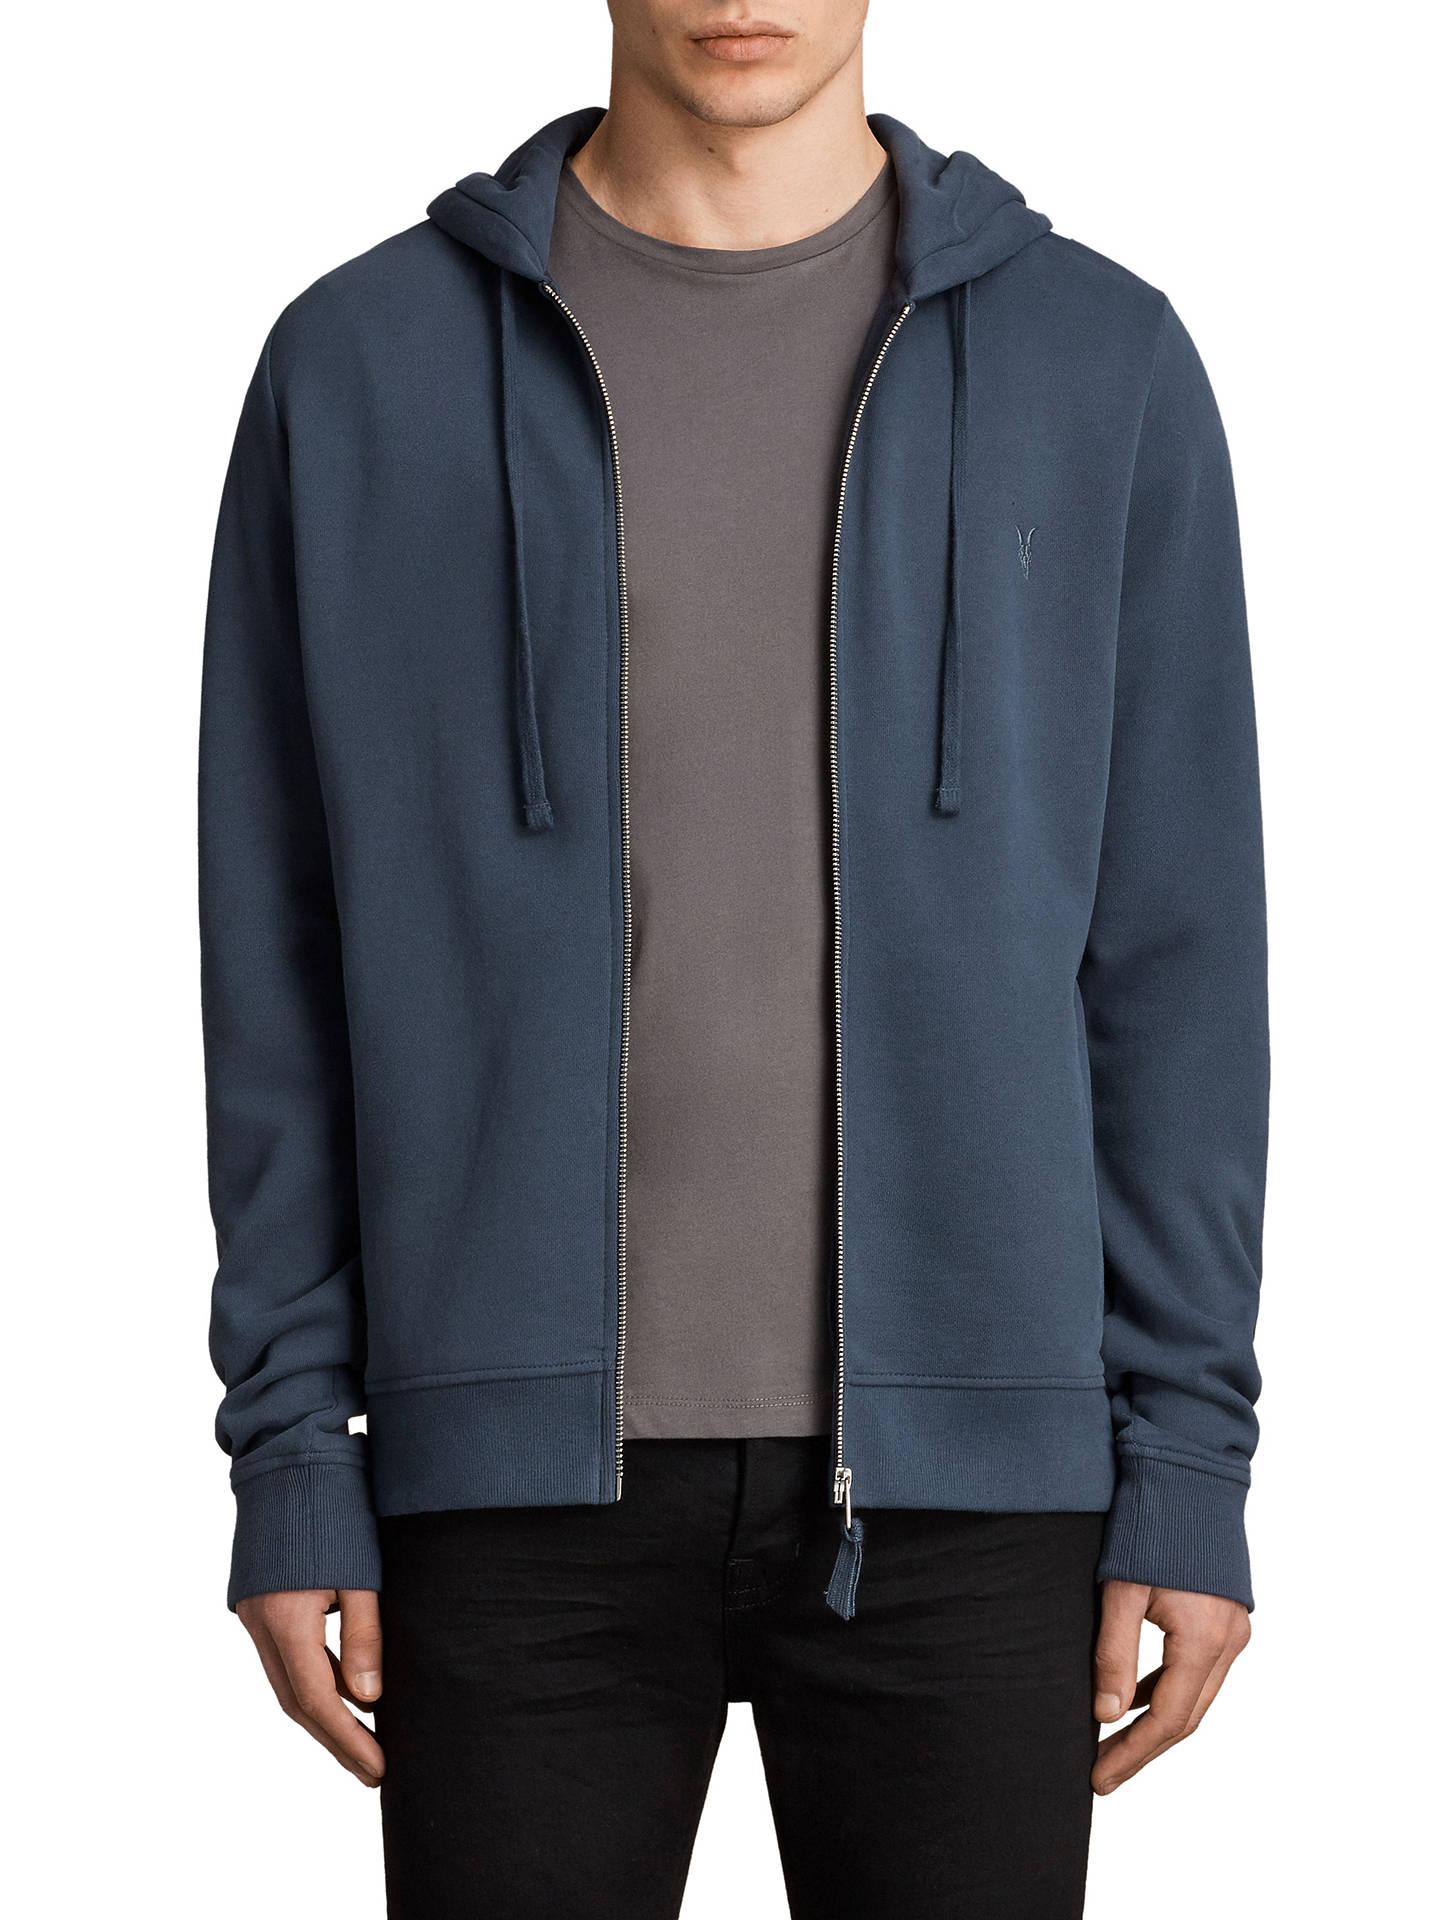 Adidas Premium Essentials Hoodie, Blue at John Lewis & Partners